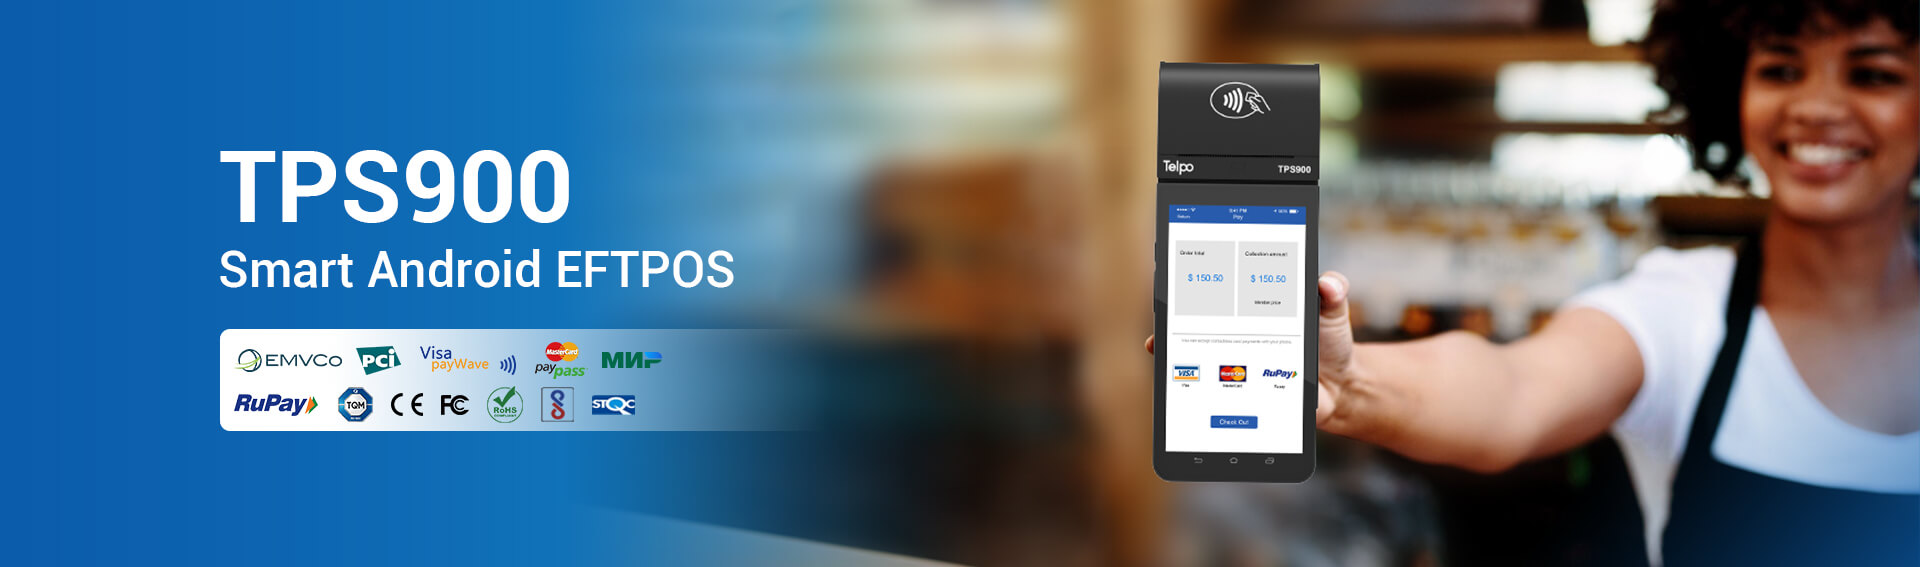 Android EFTPOS Telpo TPS900 Rupay EMV PCI